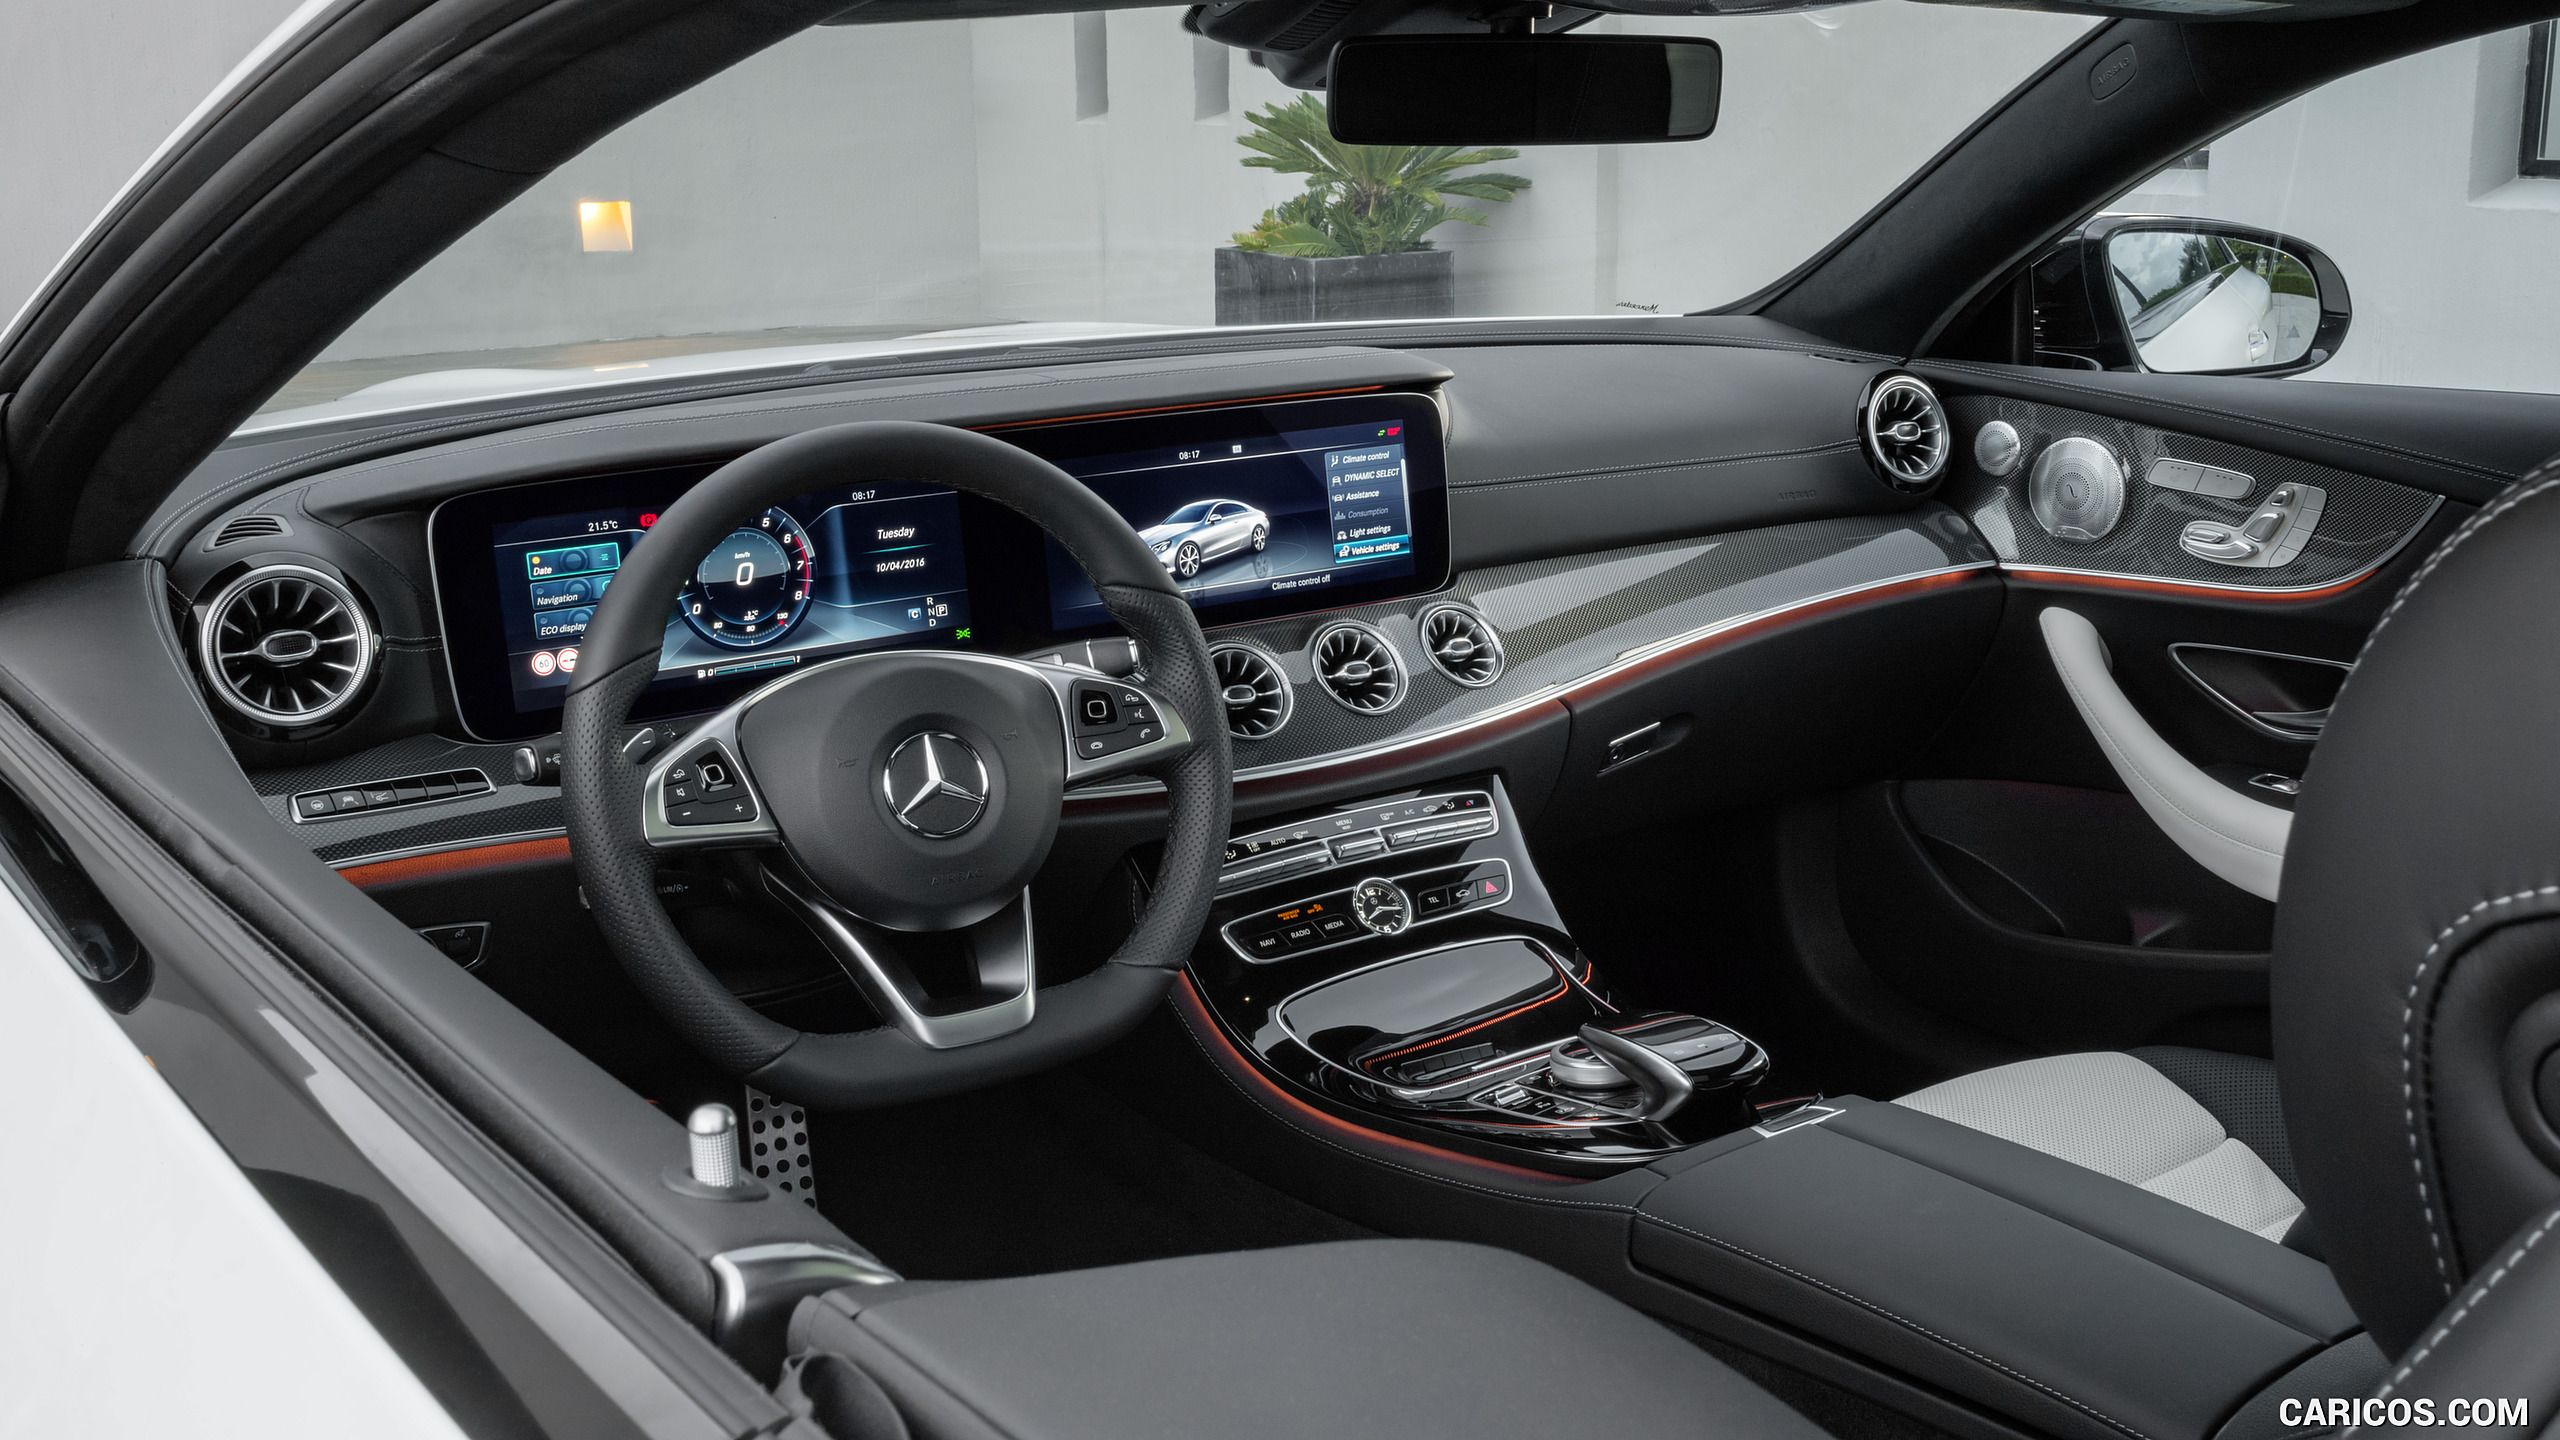 2018 Mercedes Benz E Class Coupe Wallpaper Mercedes E Class Coupe Mercedes Benz Cls Black Mercedes Benz